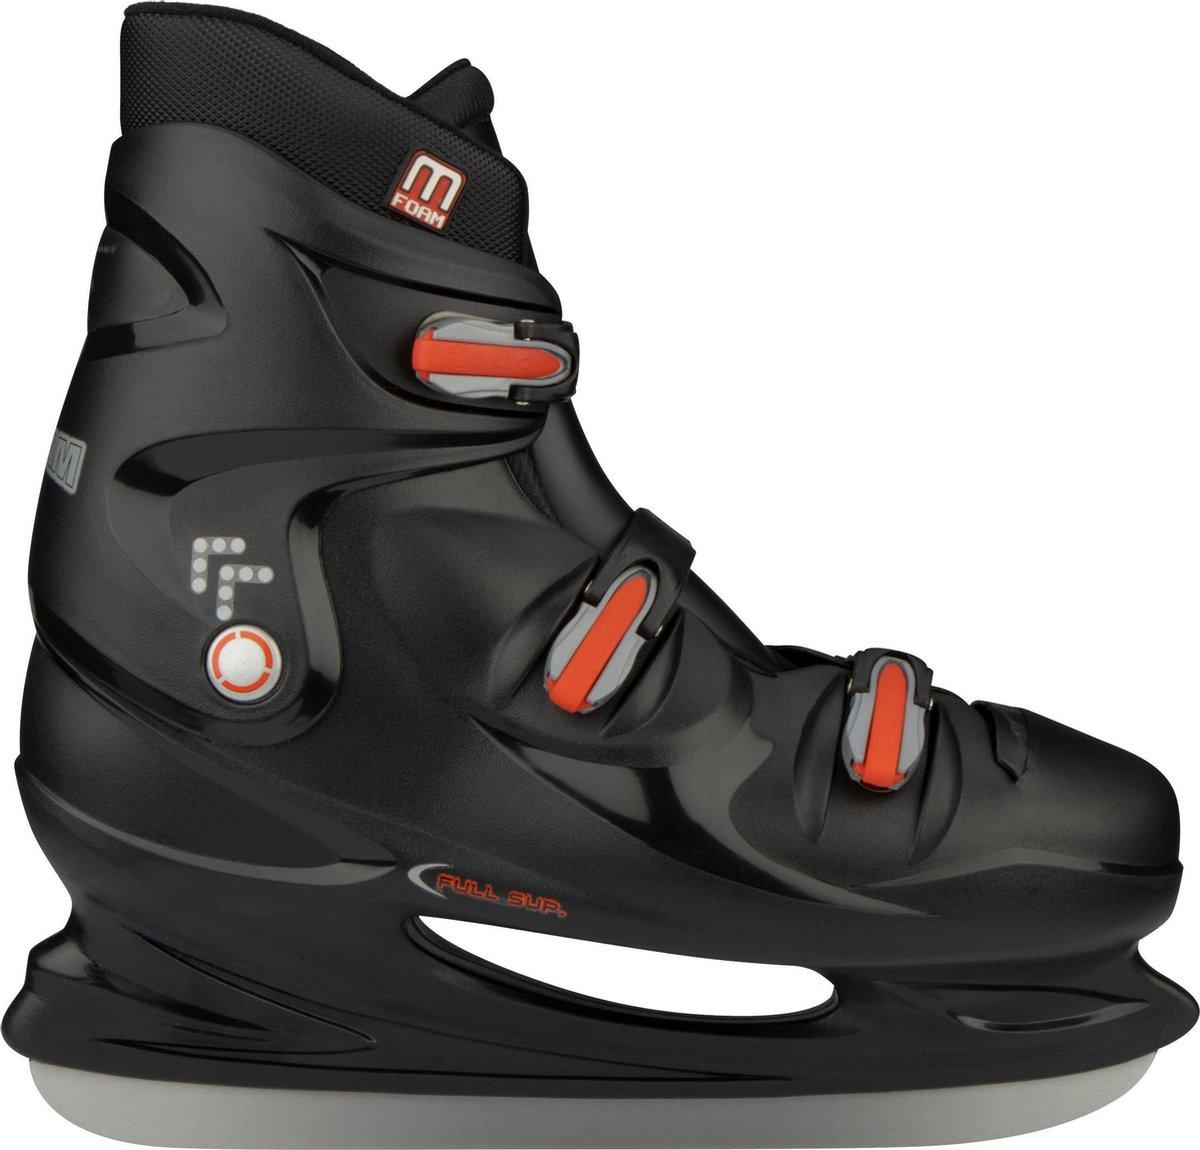 Nijdam IJshockeyschaats XXL - Hardboot - Zwart/Zilver/Rood - 48